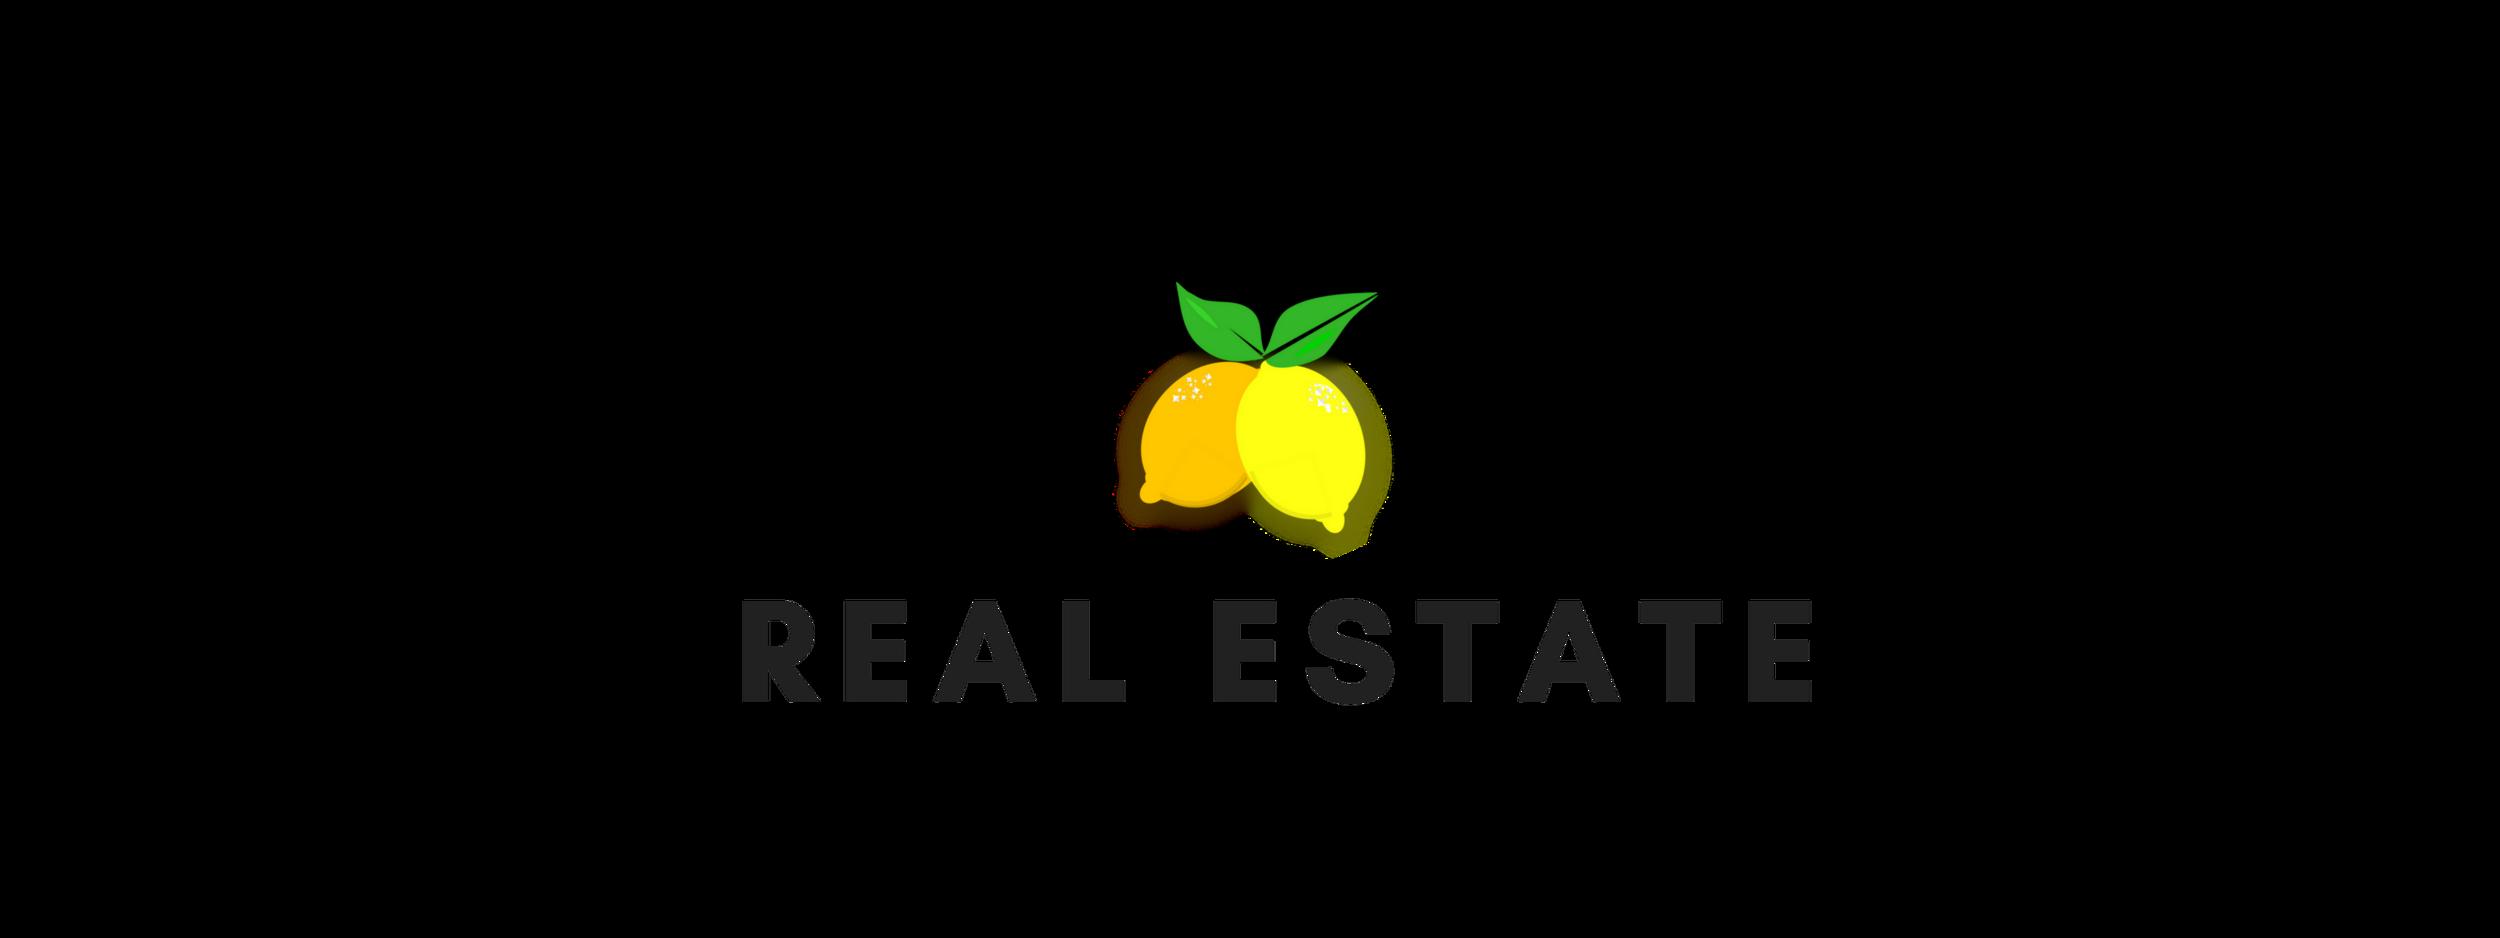 ALEXIS ARAUJO Director of Marketing  Meyer Lucas Real Estate LLC 561-406-5228 alexis@meyerlucas.com